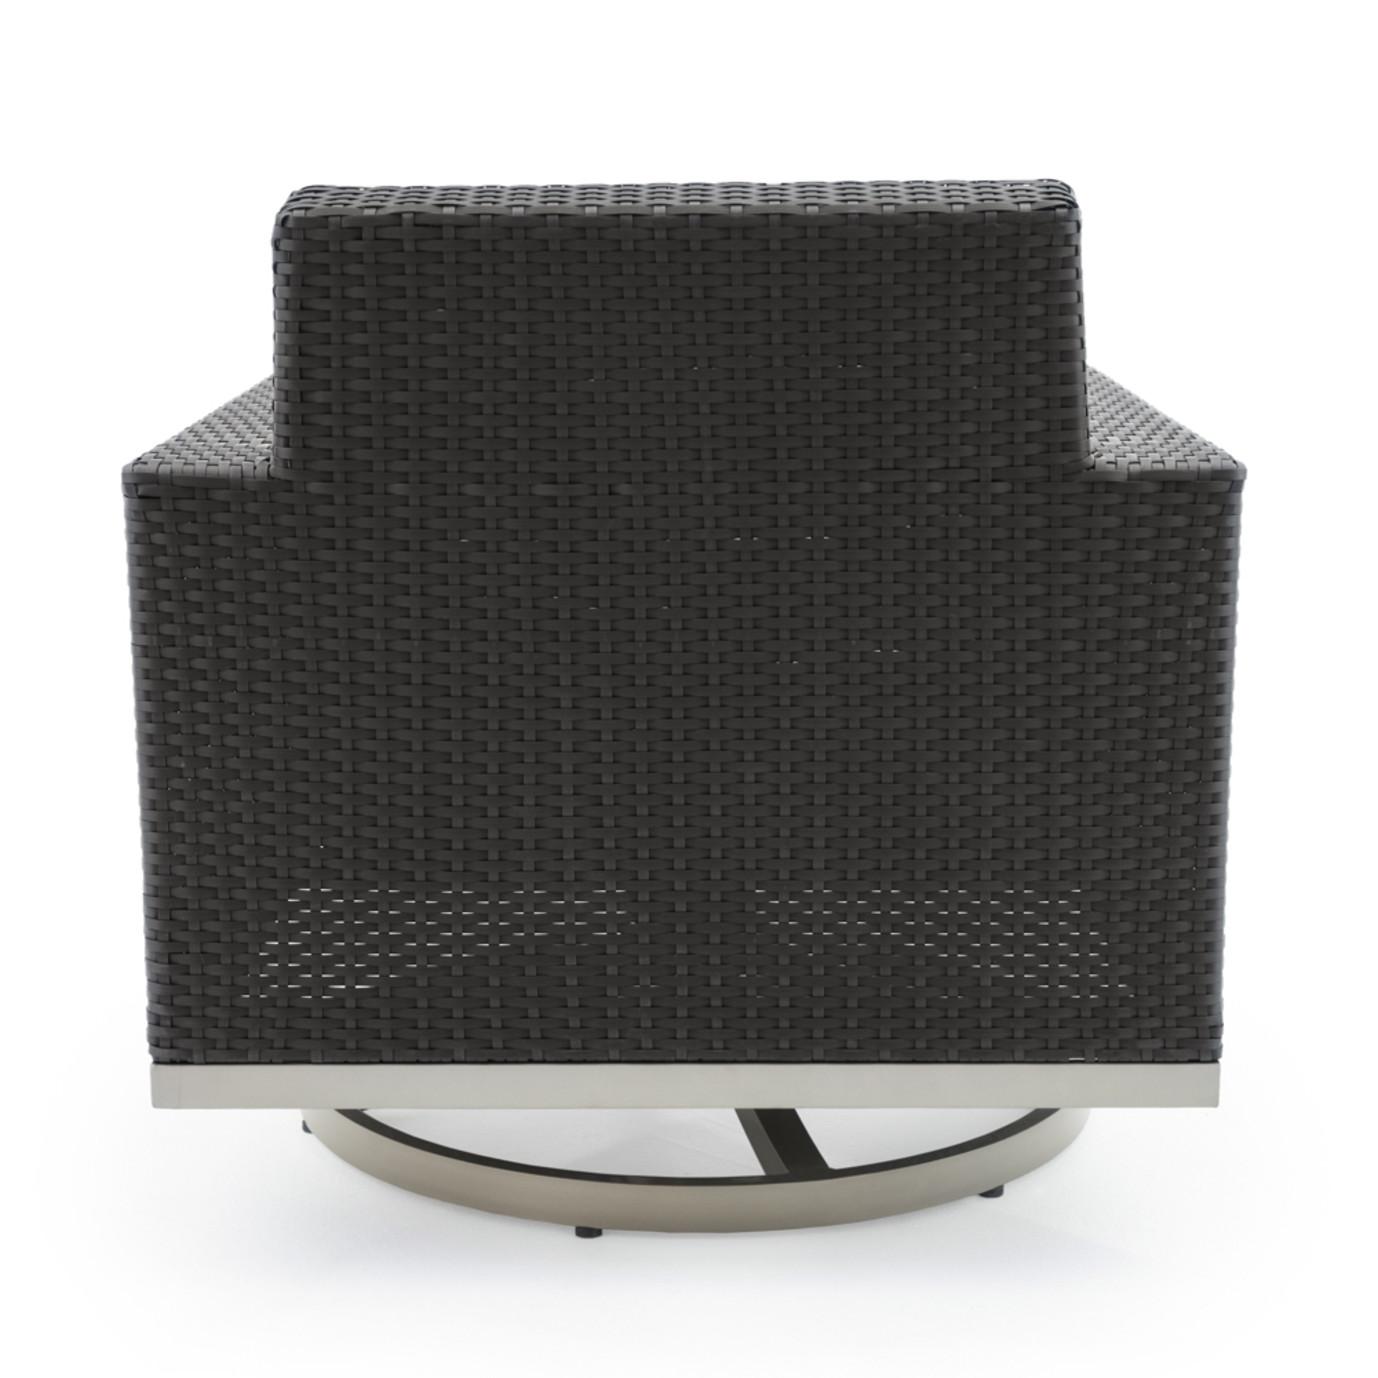 Milo™ Espresso Motion Club Chairs - Slate Gray